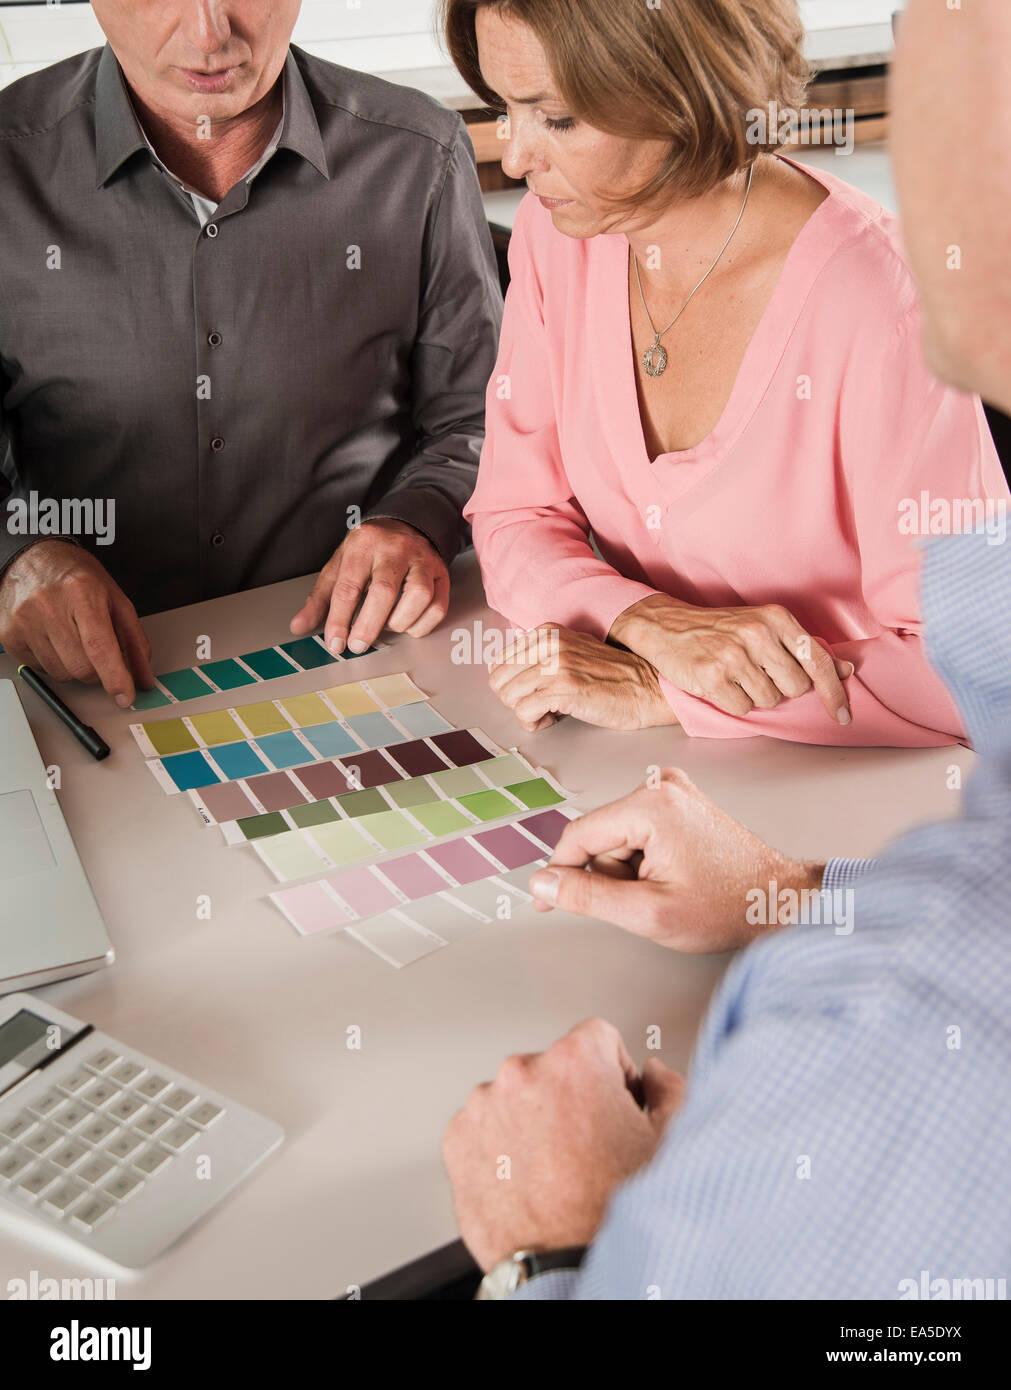 Paint Sample Stock Photos & Paint Sample Stock Images - Alamy